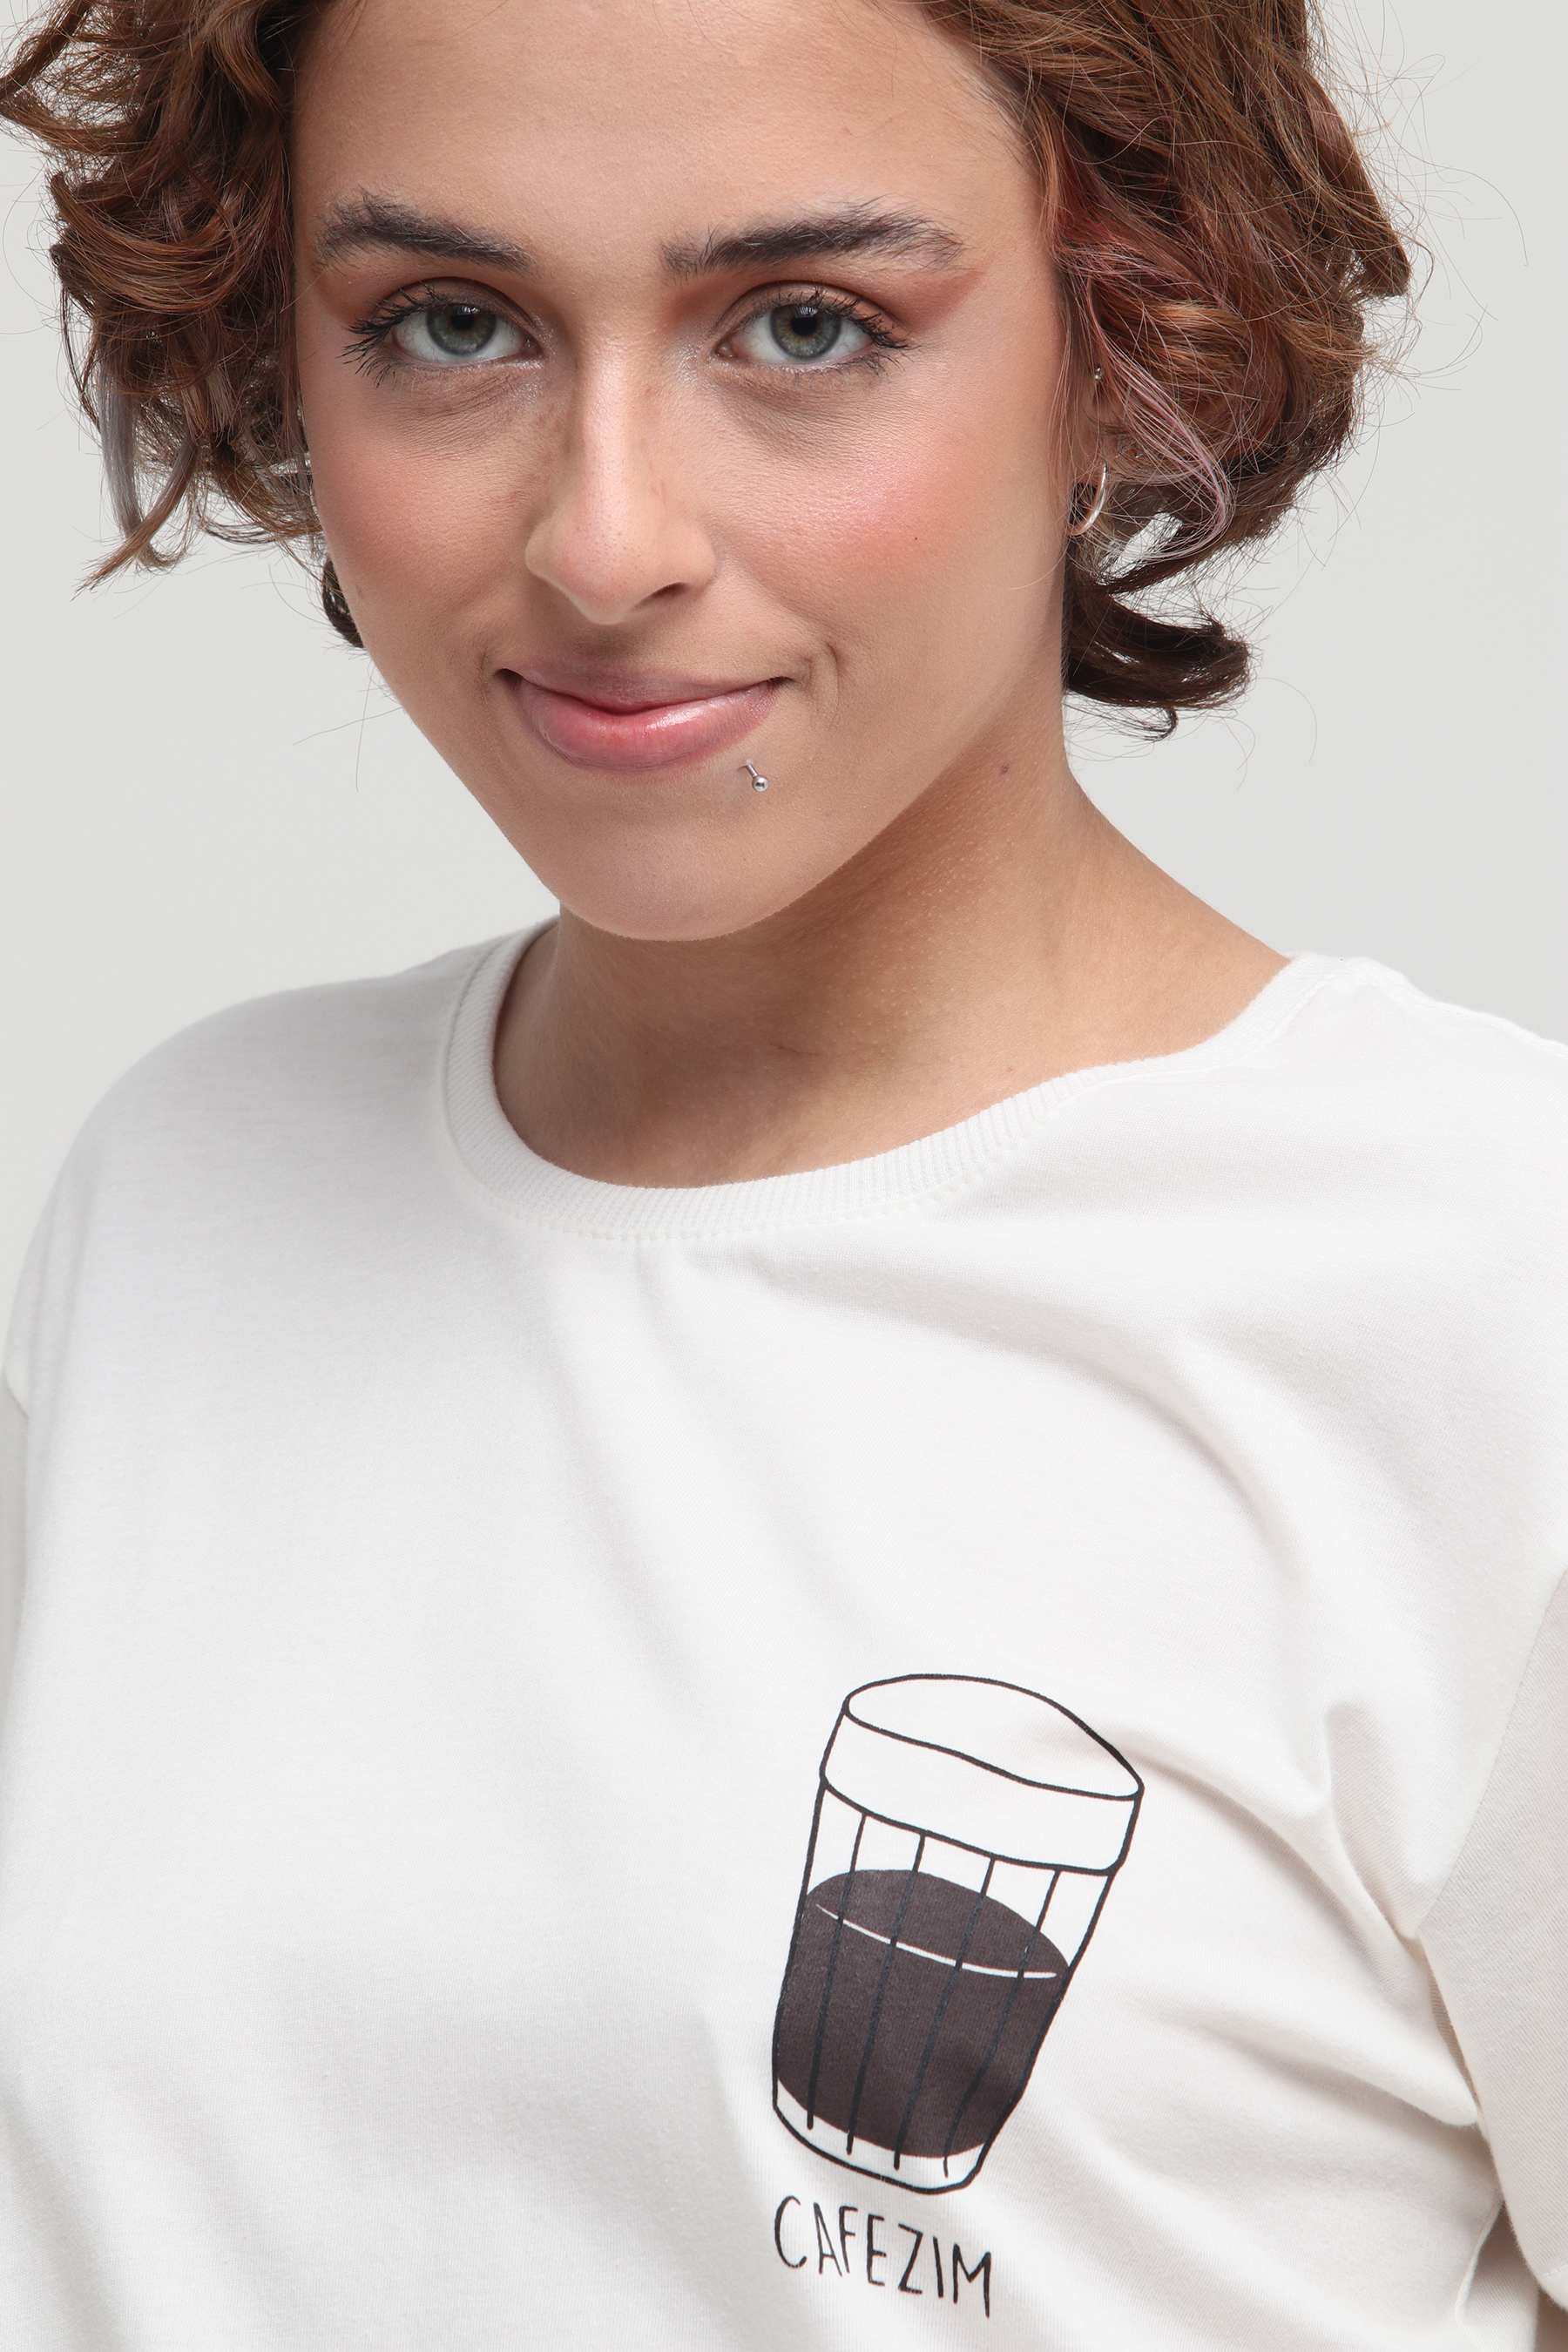 Camiseta Cafezim